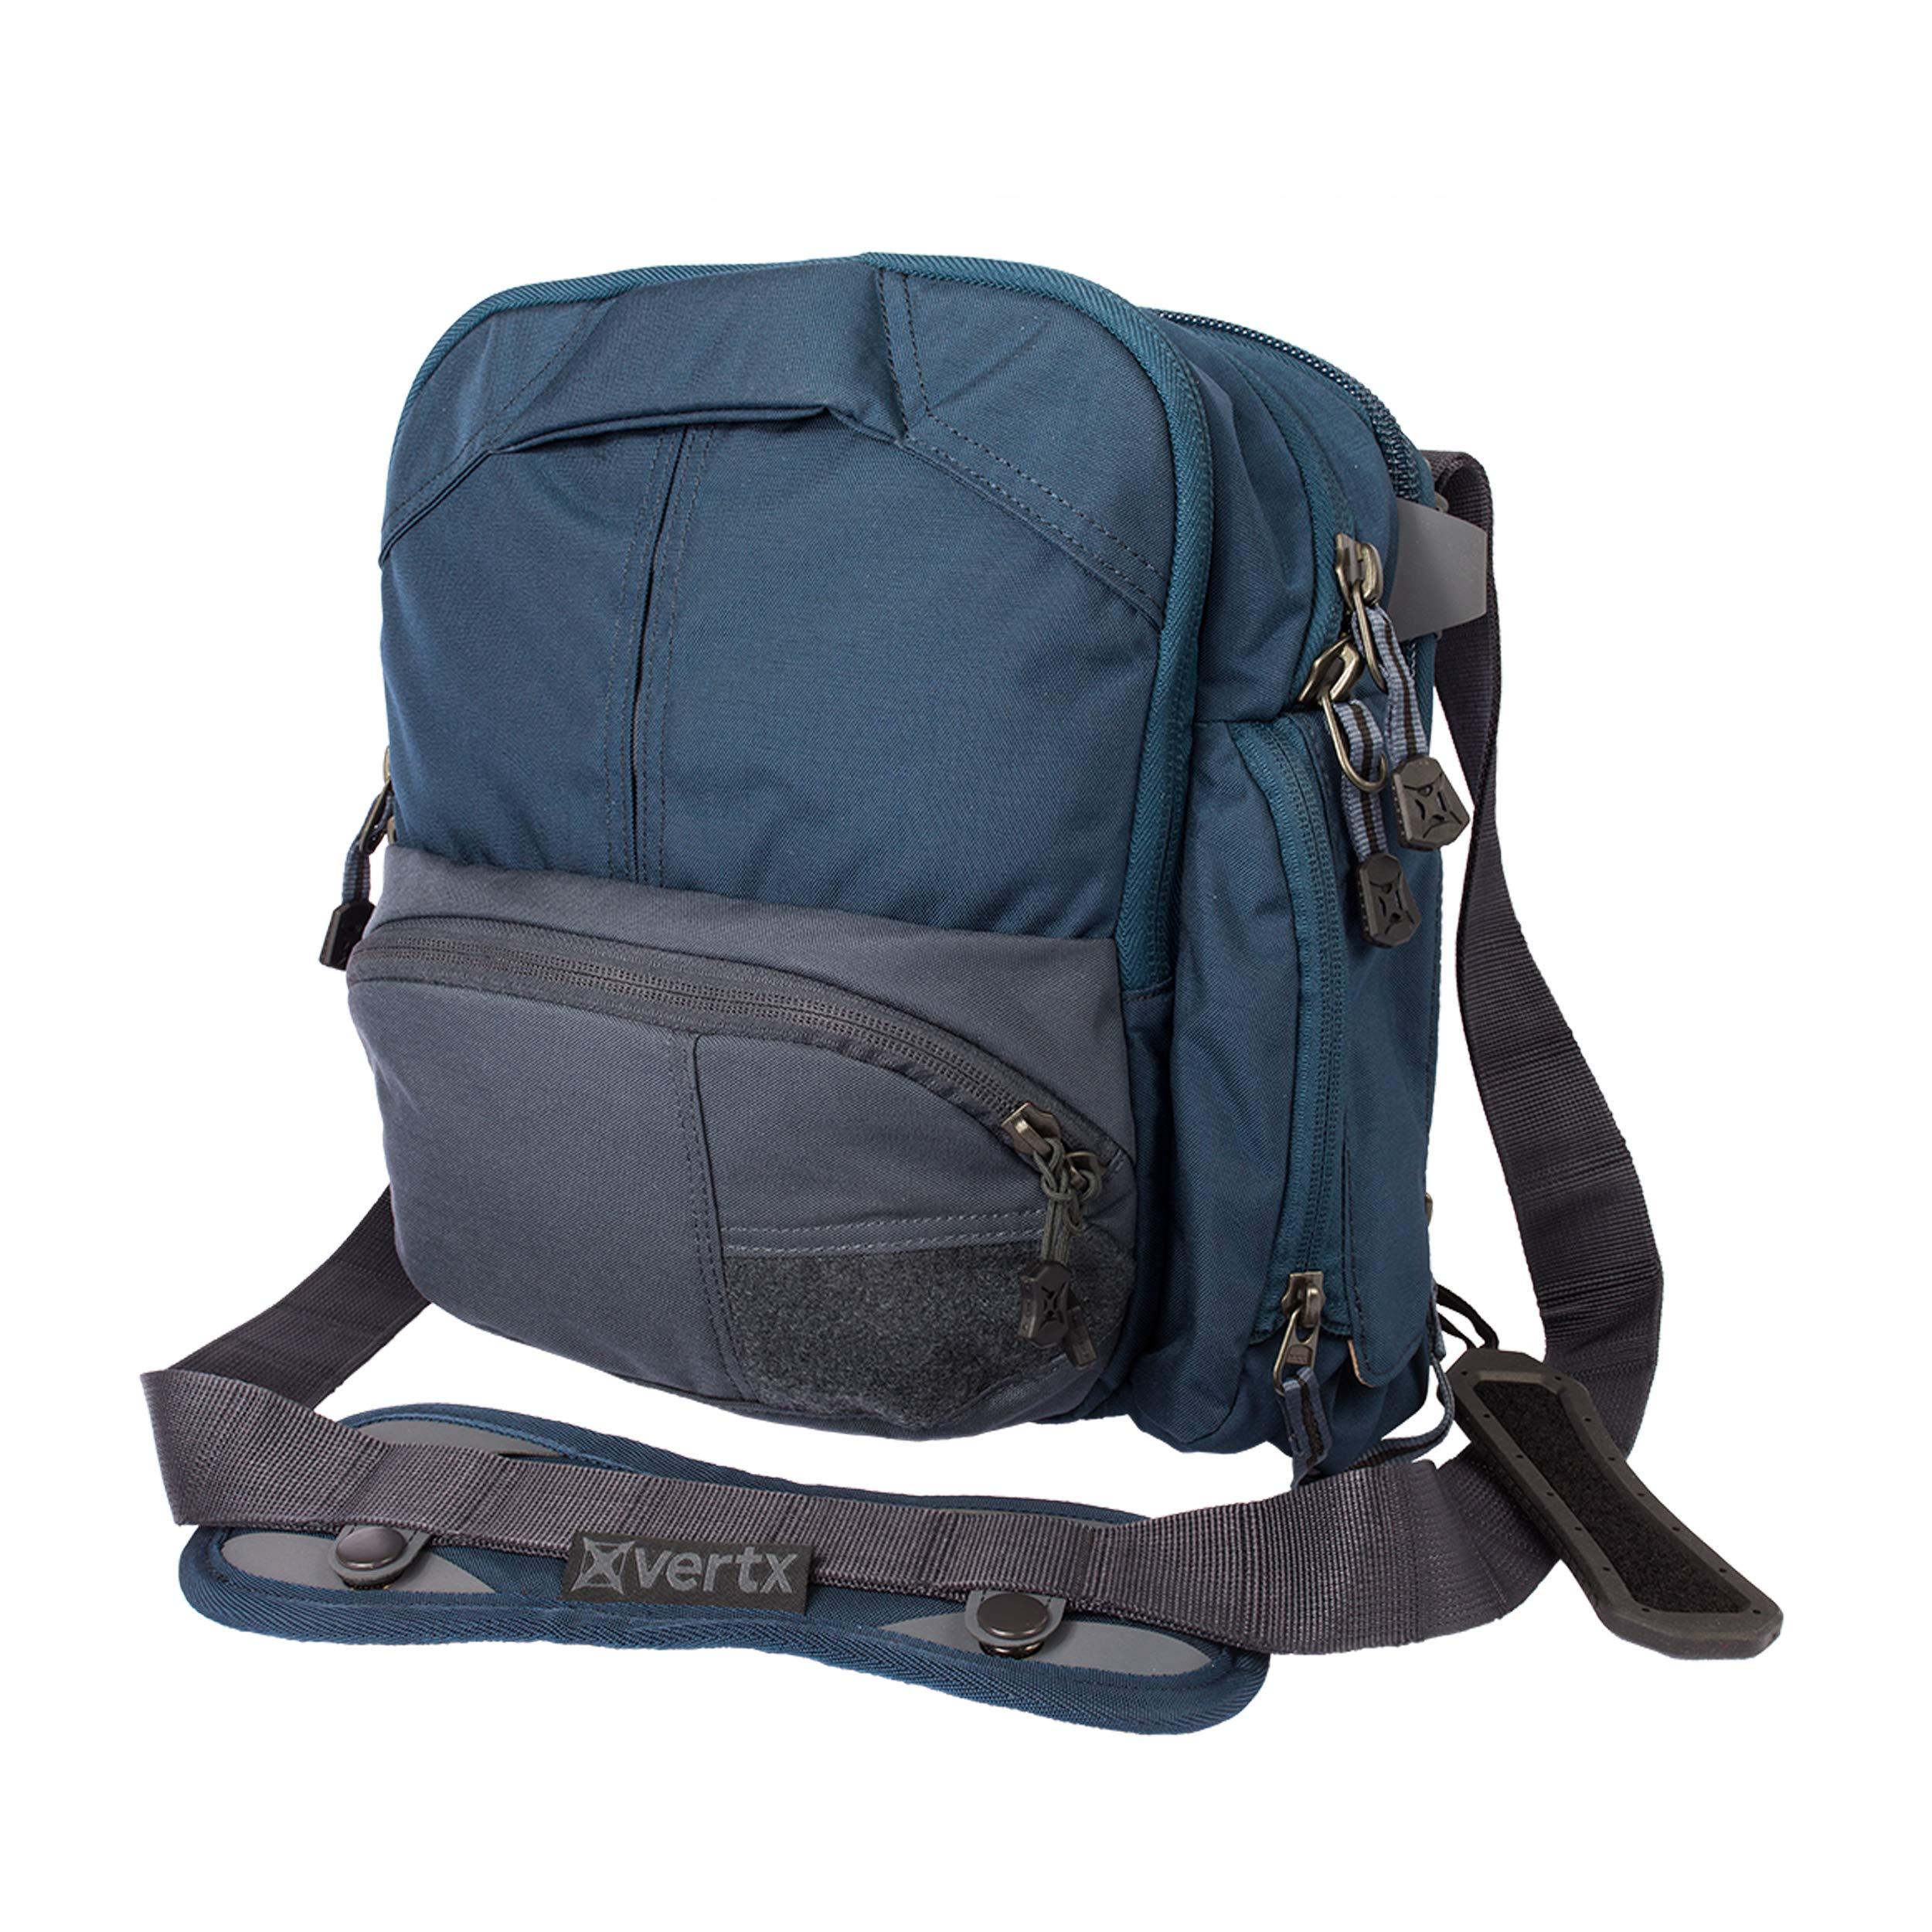 Vertx EDC Essential Go Bag Midnight Blue Smoke Navy VTX5030